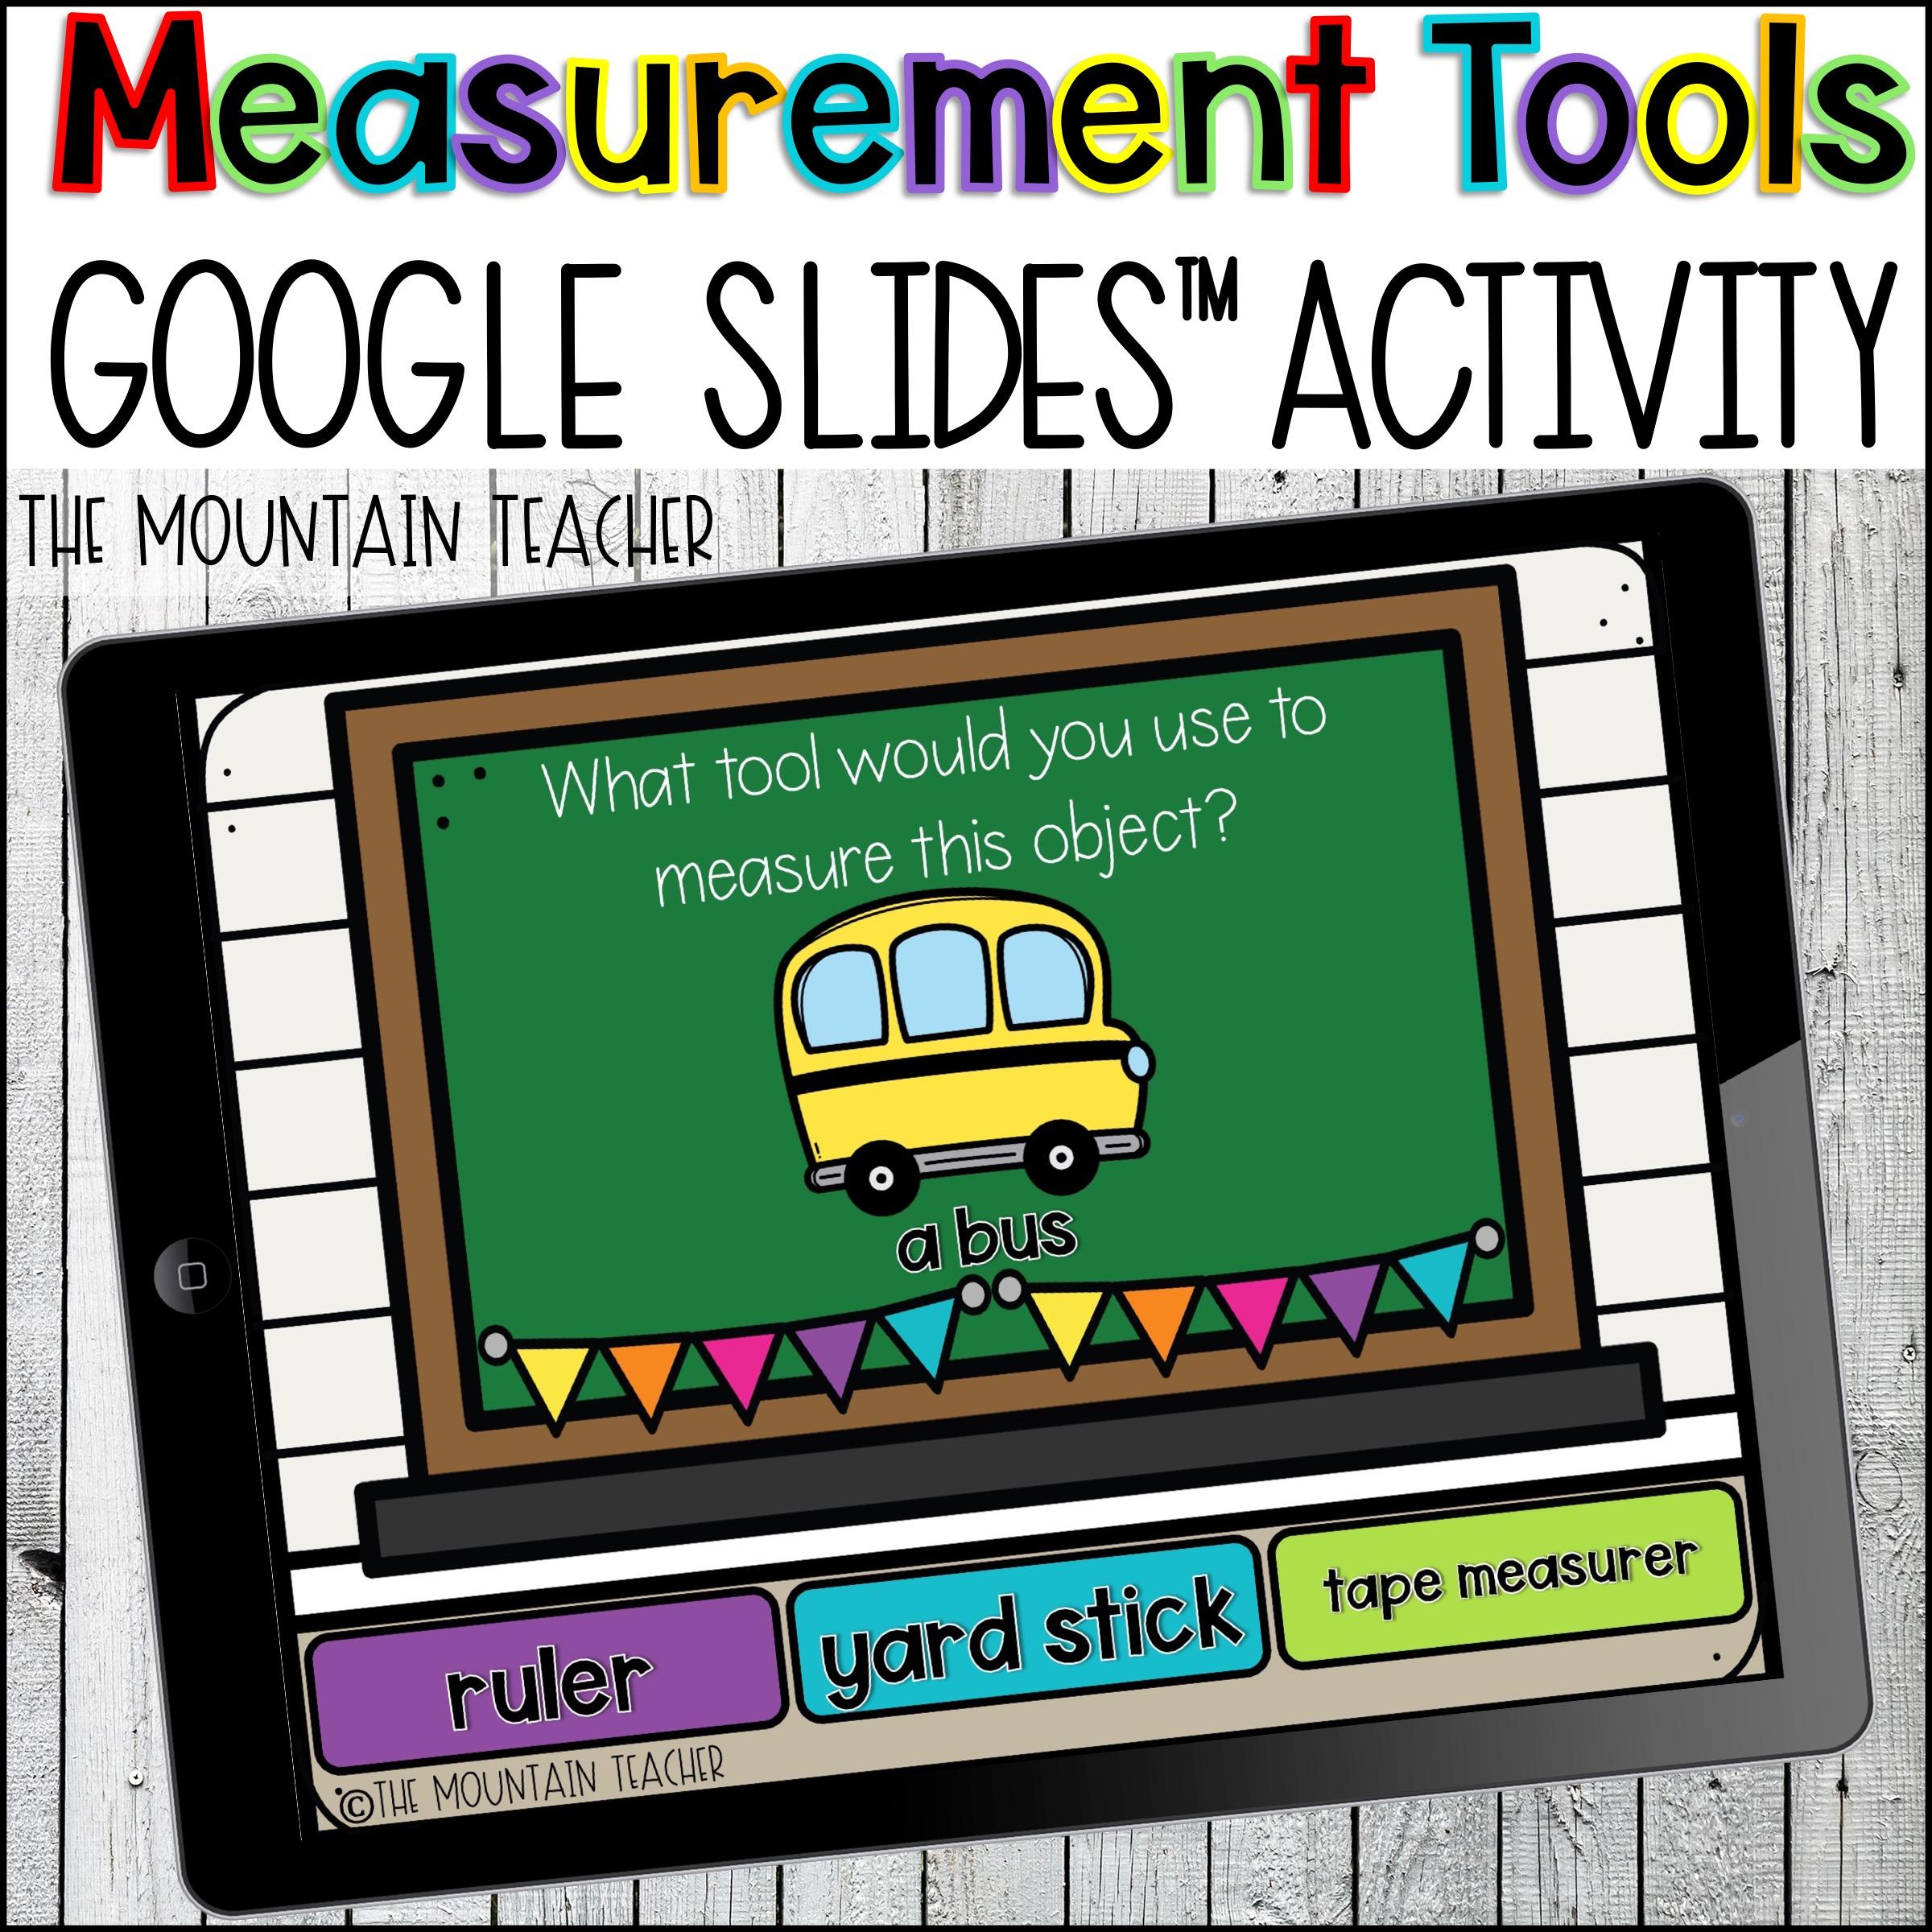 Measurement Tools Measurement Google slides for google classroom by The Mountain Teacher